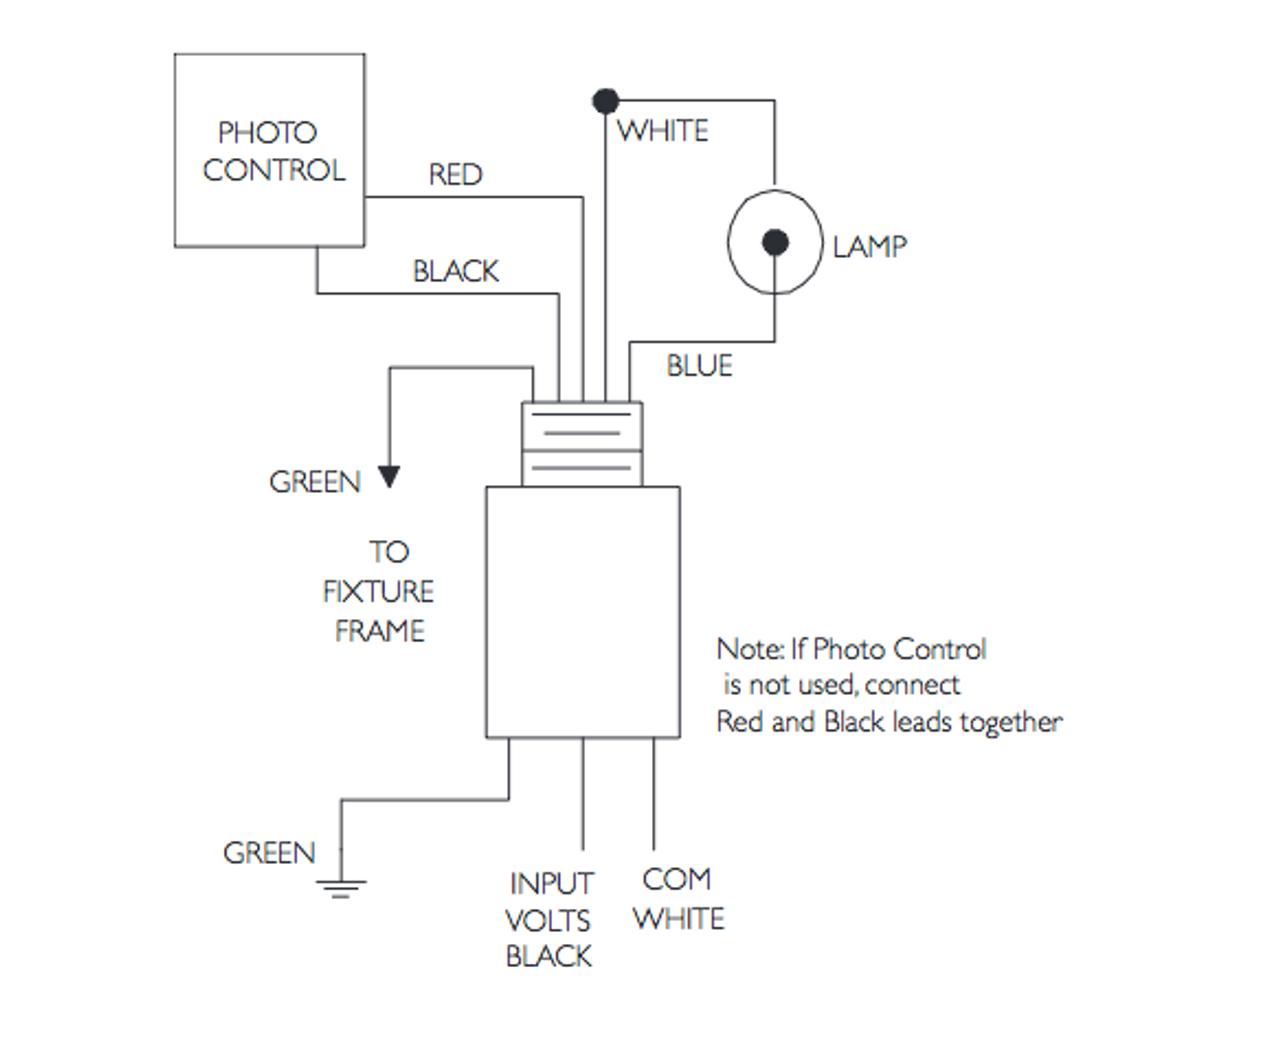 Advance Hps Ballast Wiring Diagram Autotransformer Starter Wiring Diagram Begeboy Wiring Diagram Source